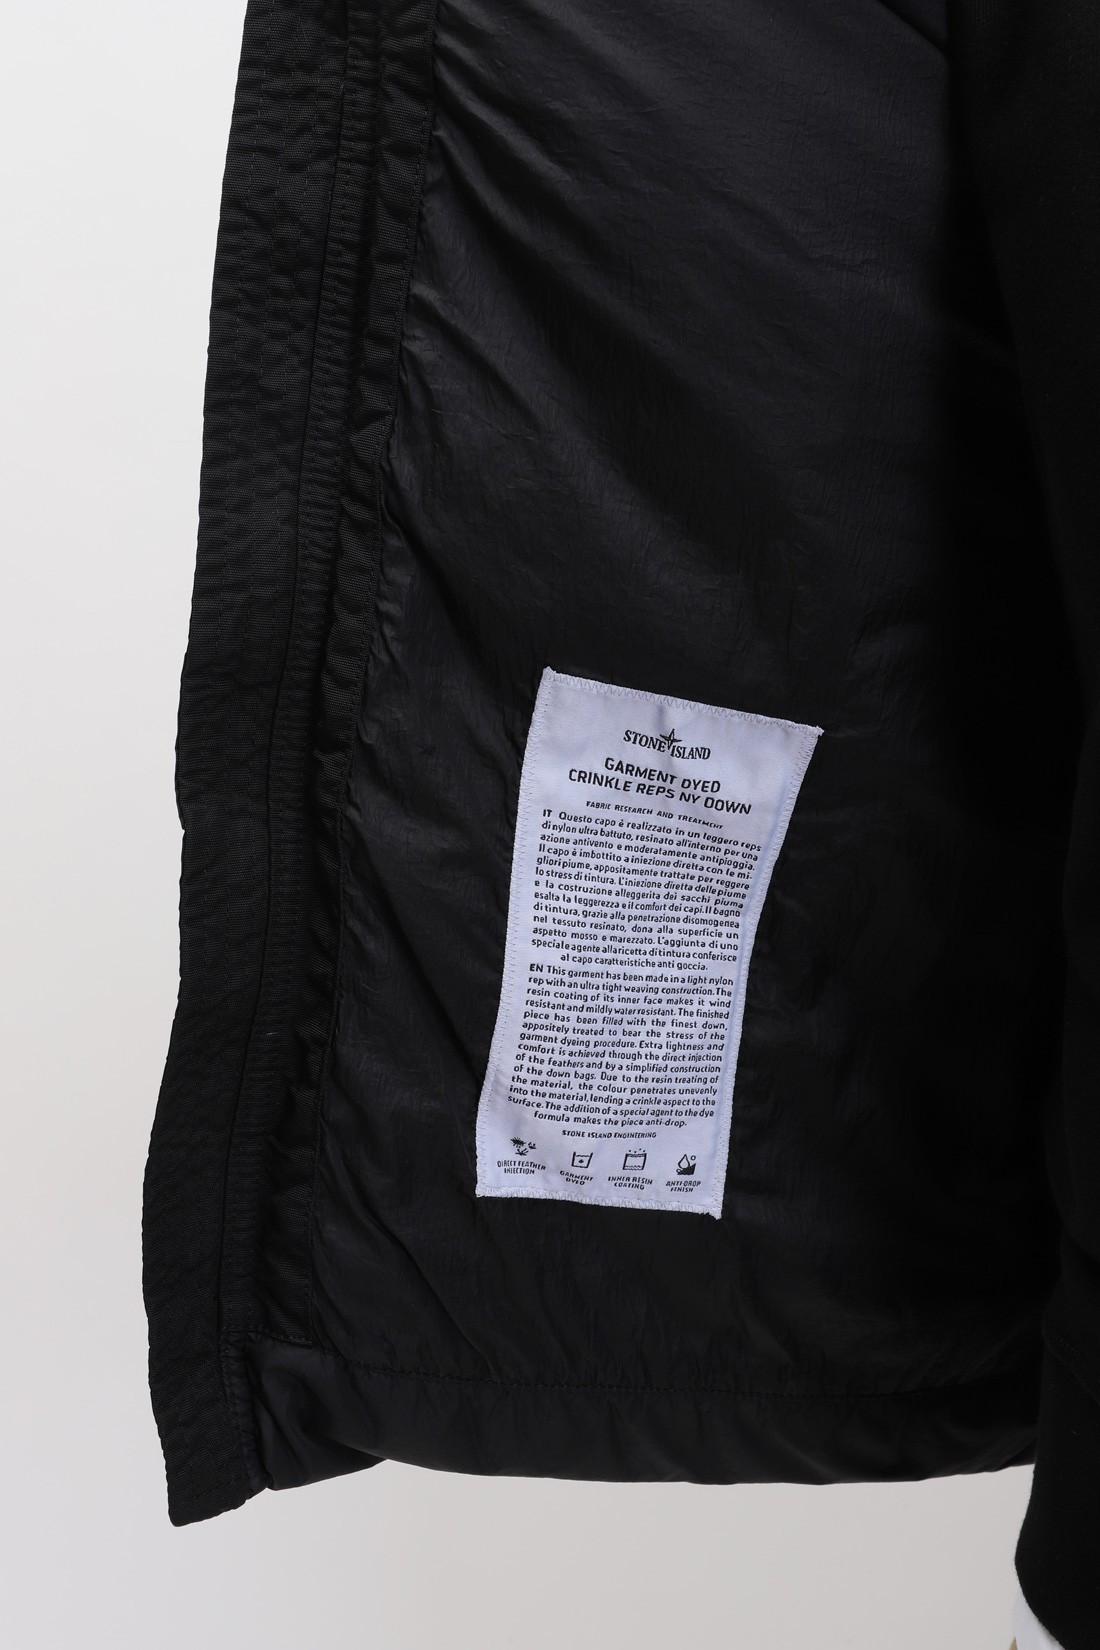 STONE ISLAND / 40123 crinkle reps sleeveless V0029 nero